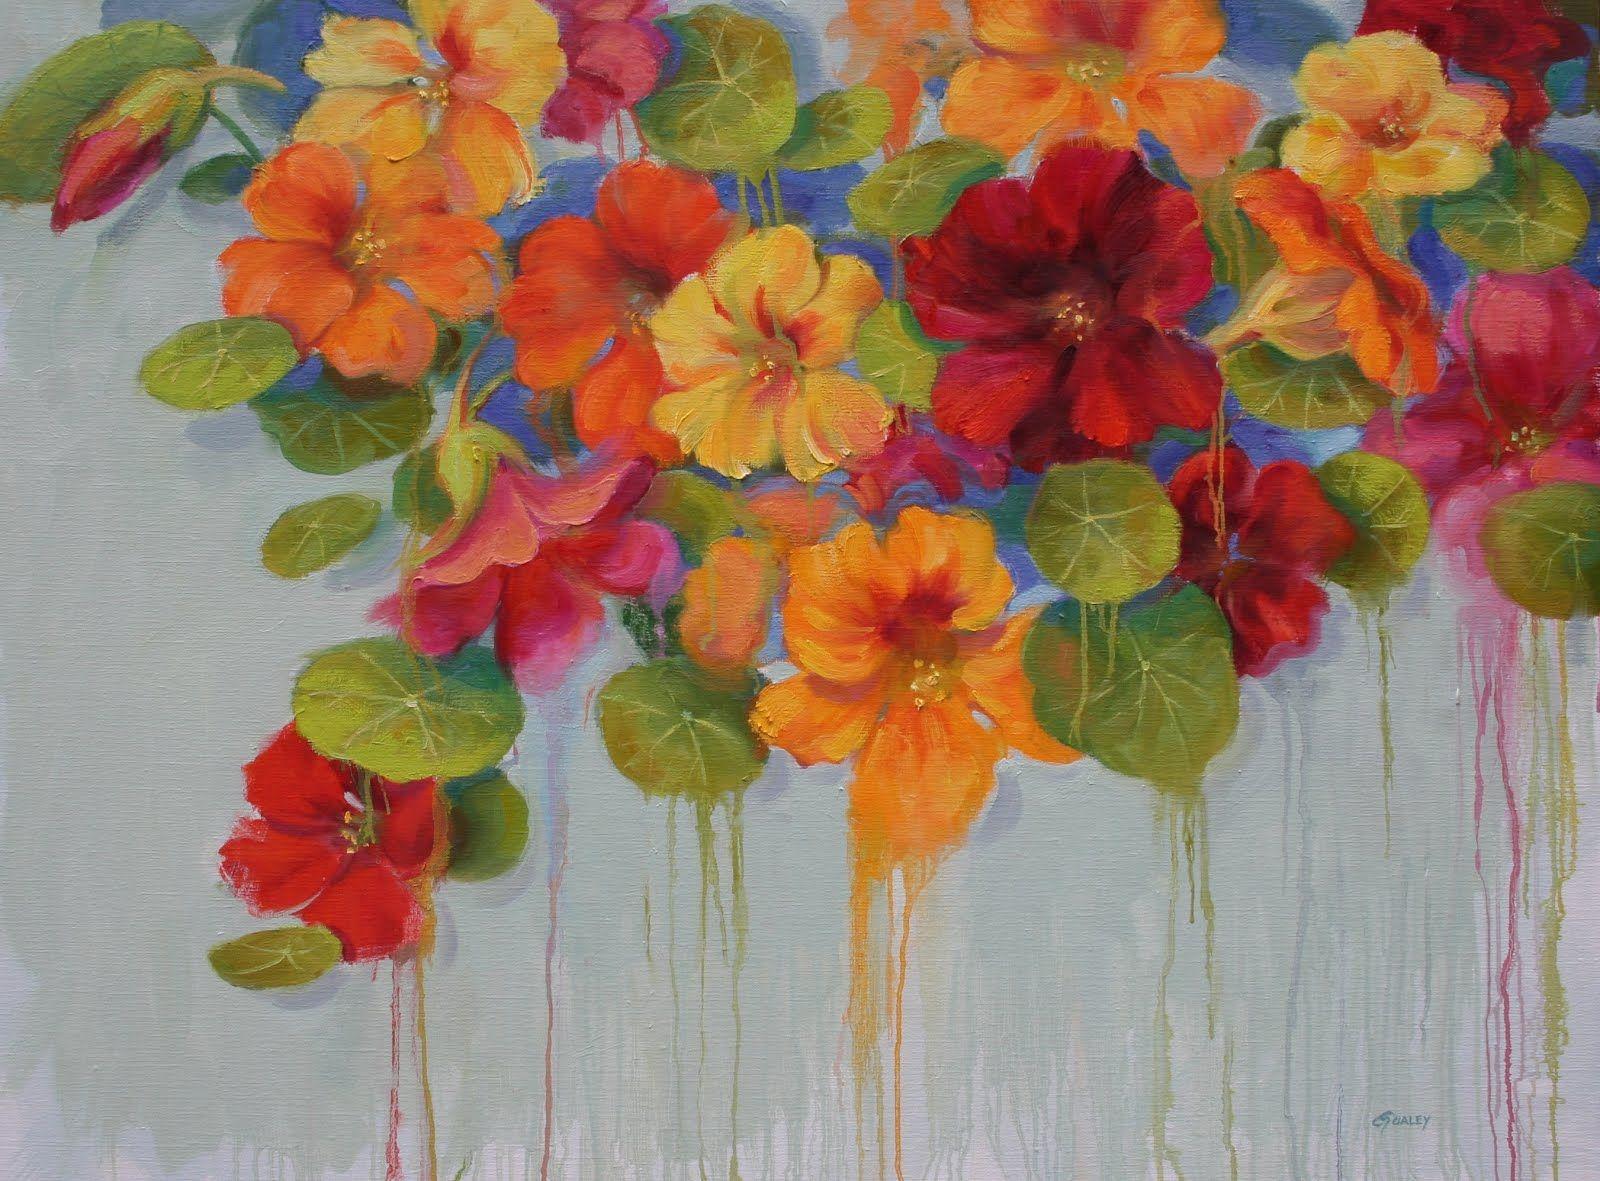 Sara Qualey Paintings Nasturtium Pinterest Paintings